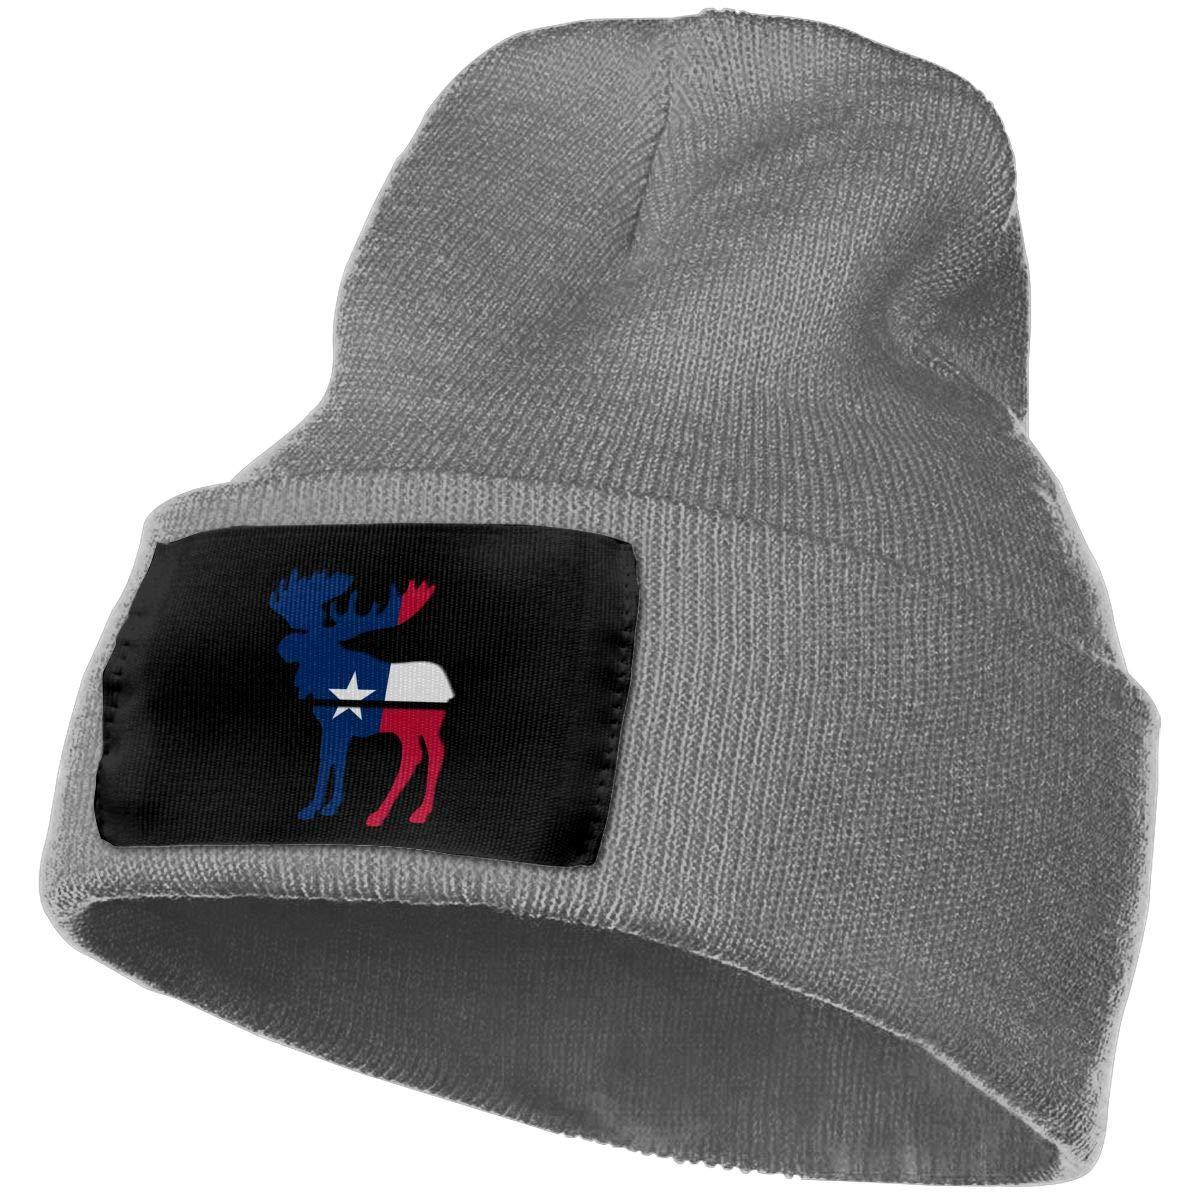 100/% Acrylic Skull Cap MXMAOM9MX Moose Texas Flag Warm Knitting Hat Mens Womens